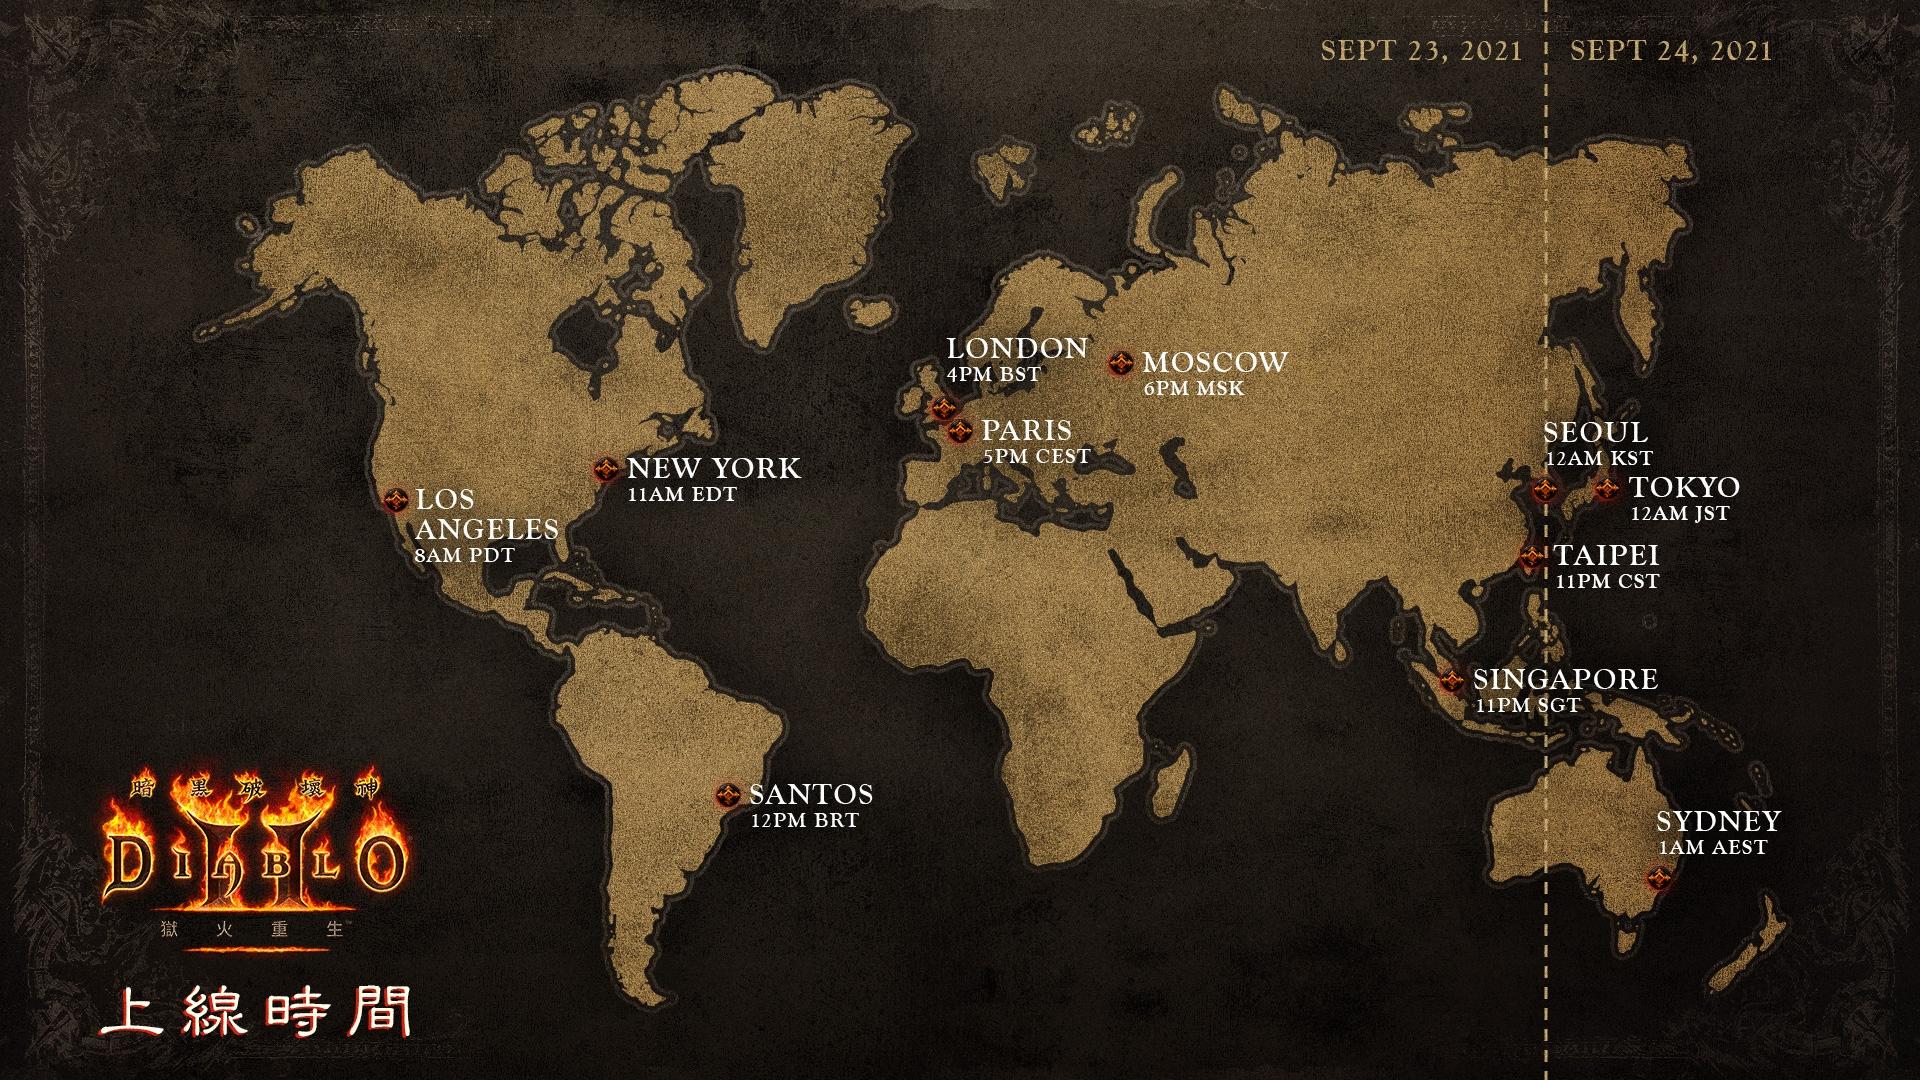 D2R_Launch_Map_1920x1080_02.jpg